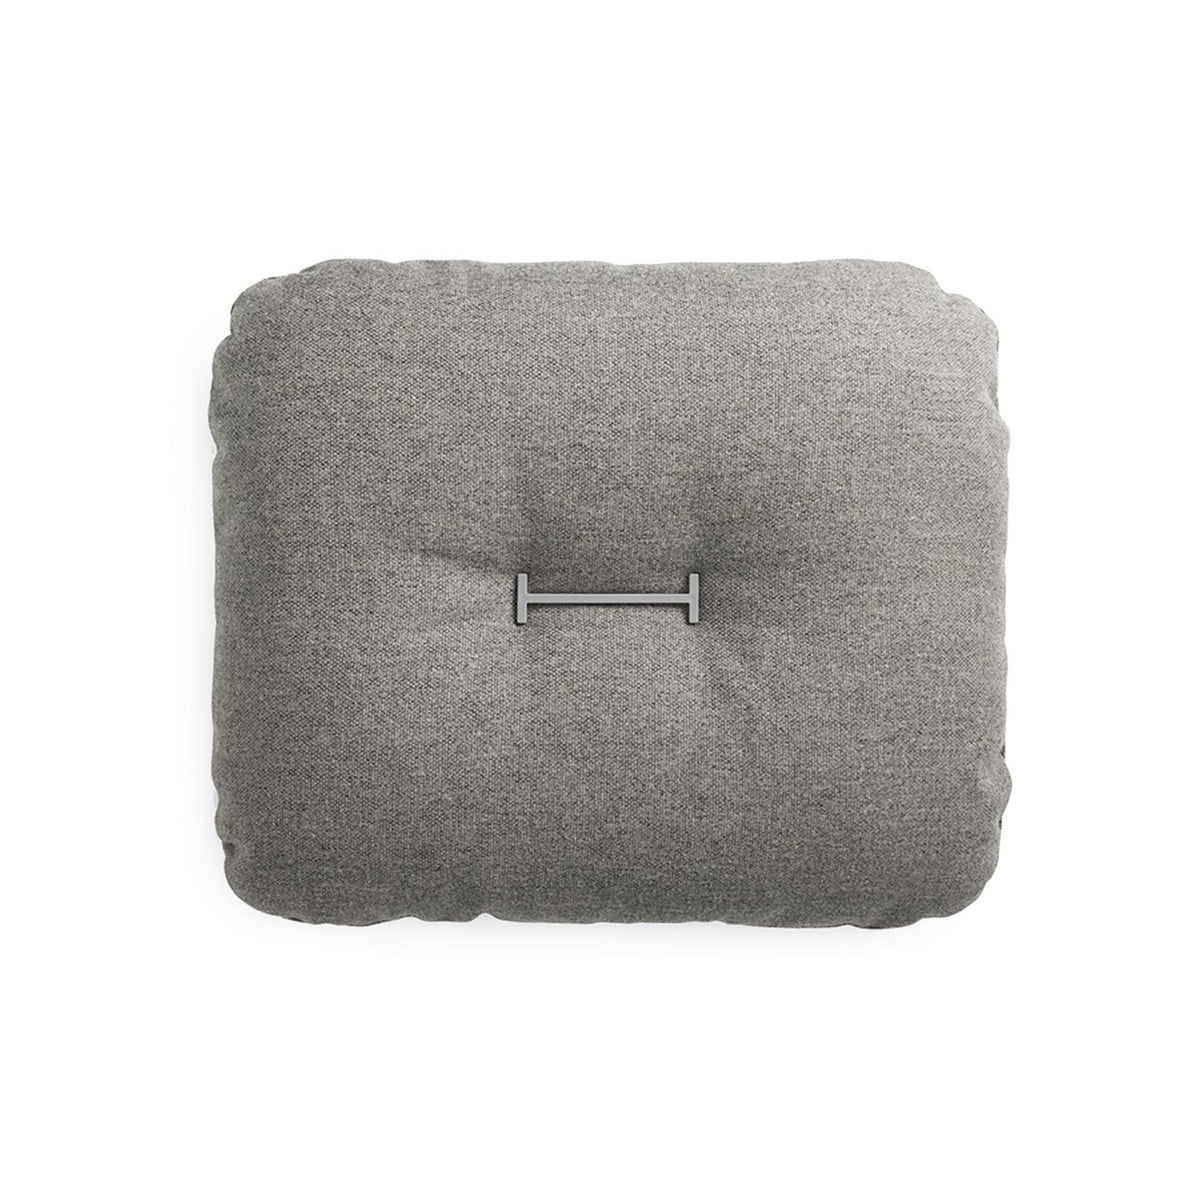 Normann Copenhagen - Hi Cushion Flax 50 x 60 cm, grau   Heimtextilien > Decken und Kissen > Kissen   Grau   Normann Copenhagen